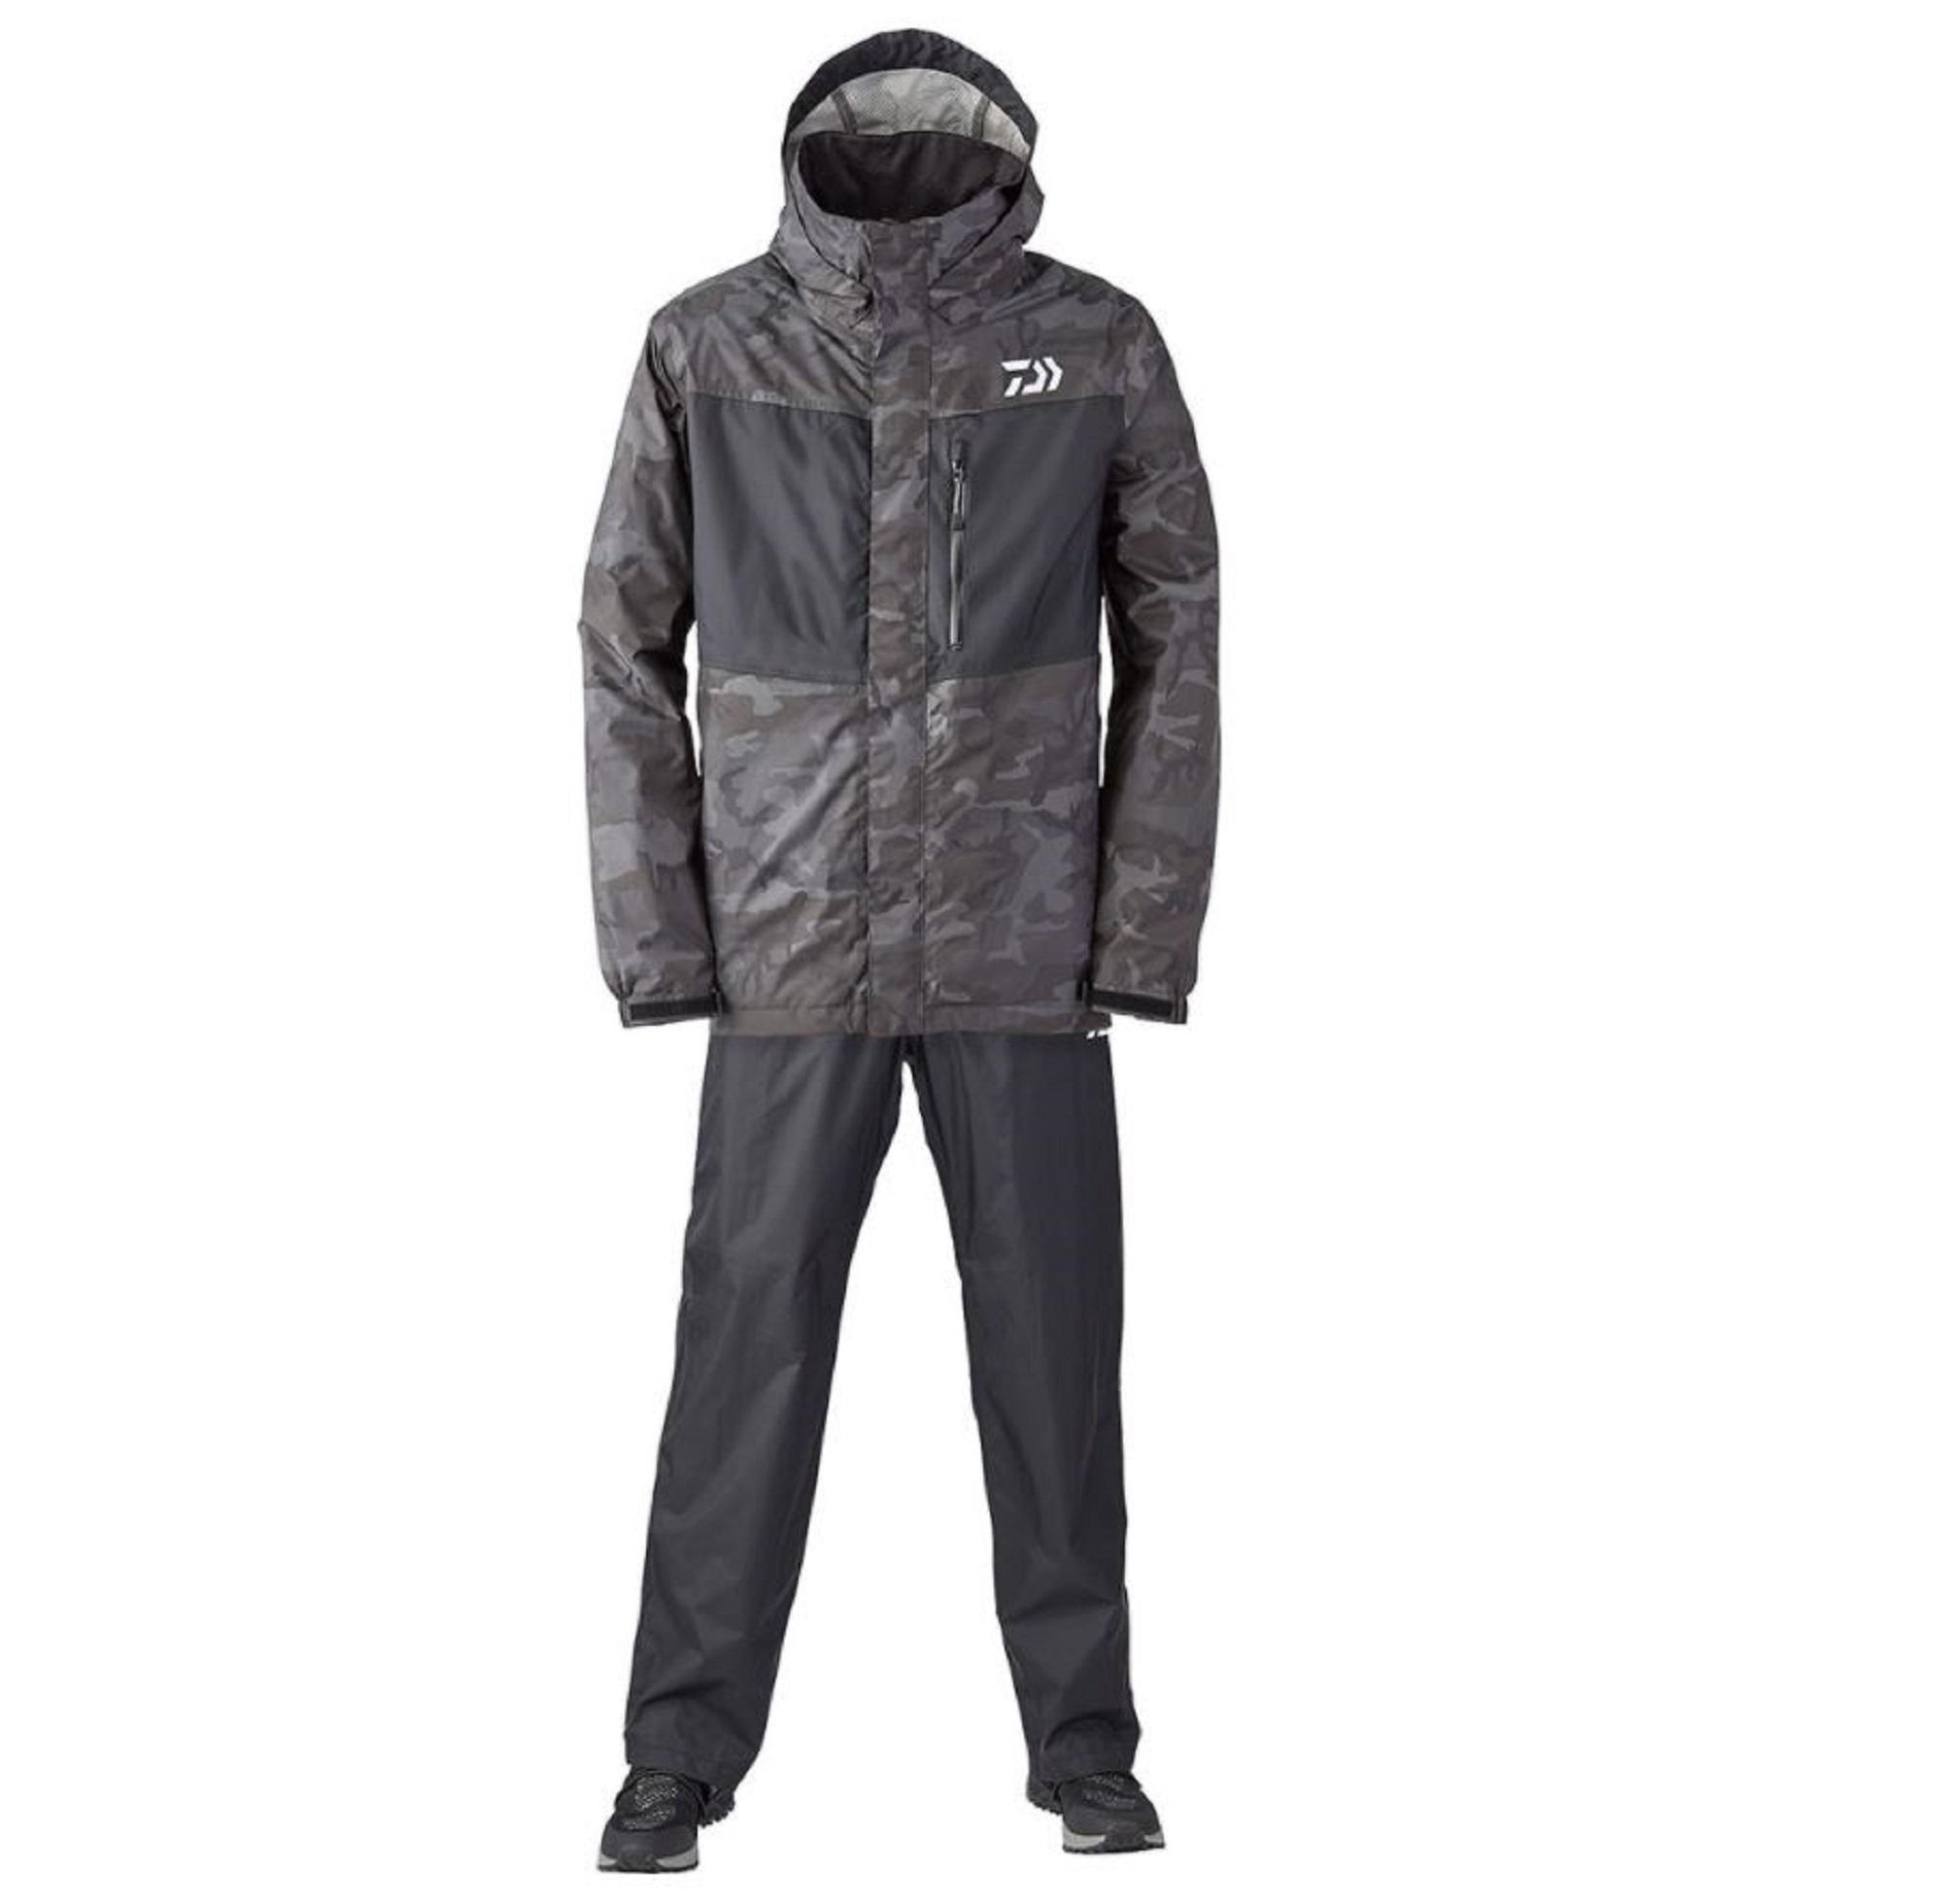 Daiwa DR-3621 Rainmax Water Repellent Jacket Size L Black Camo (6299)